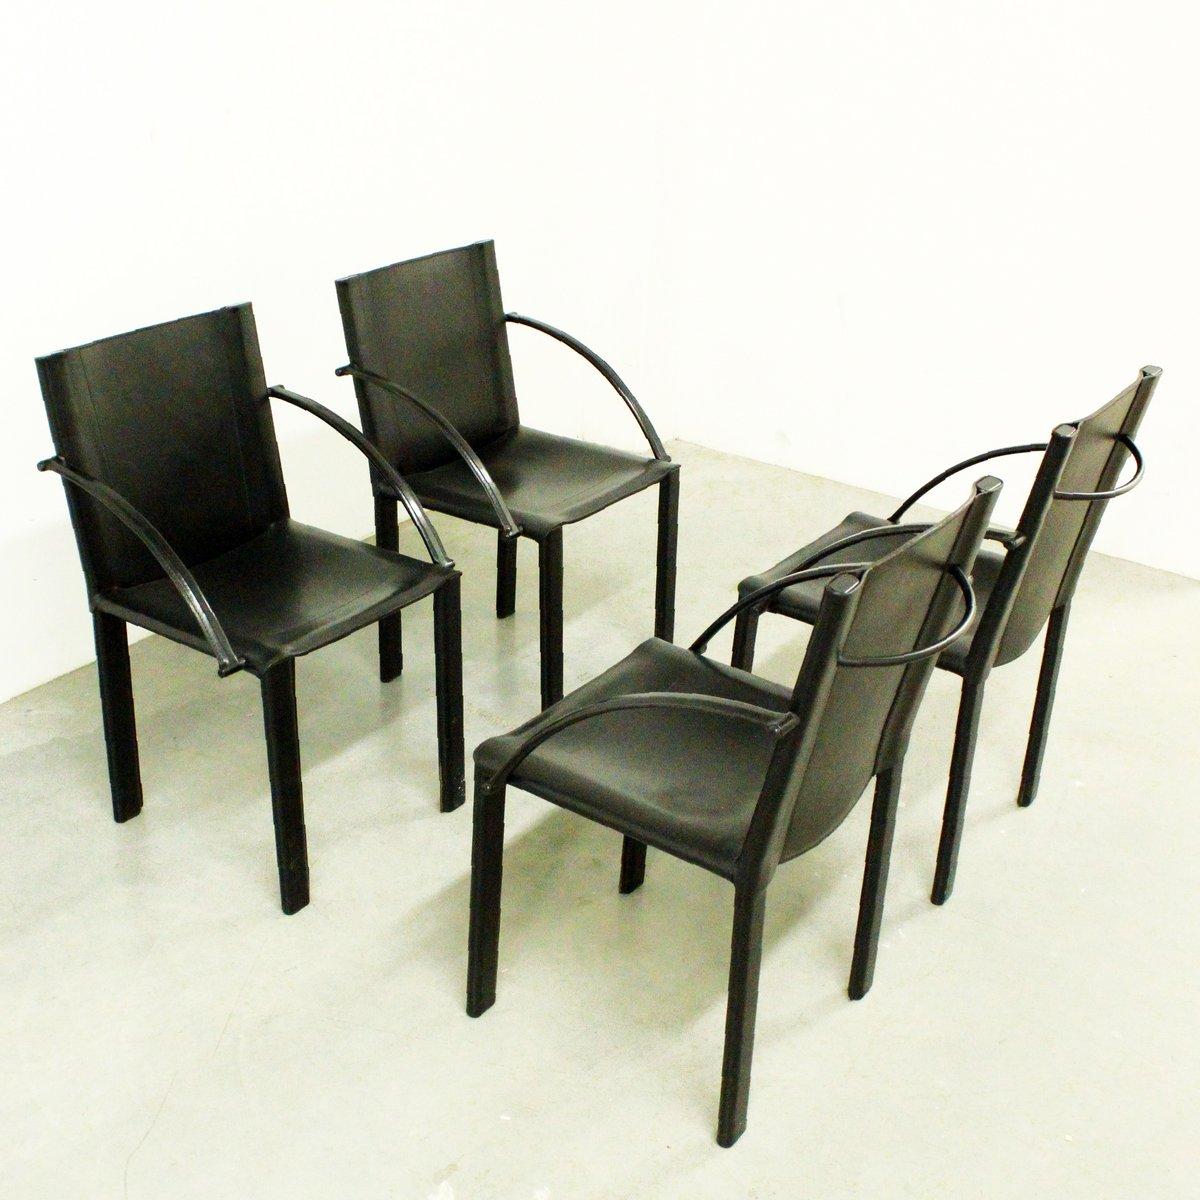 coral st hle von matteo grassi 1980er 4er set bei pamono kaufen. Black Bedroom Furniture Sets. Home Design Ideas